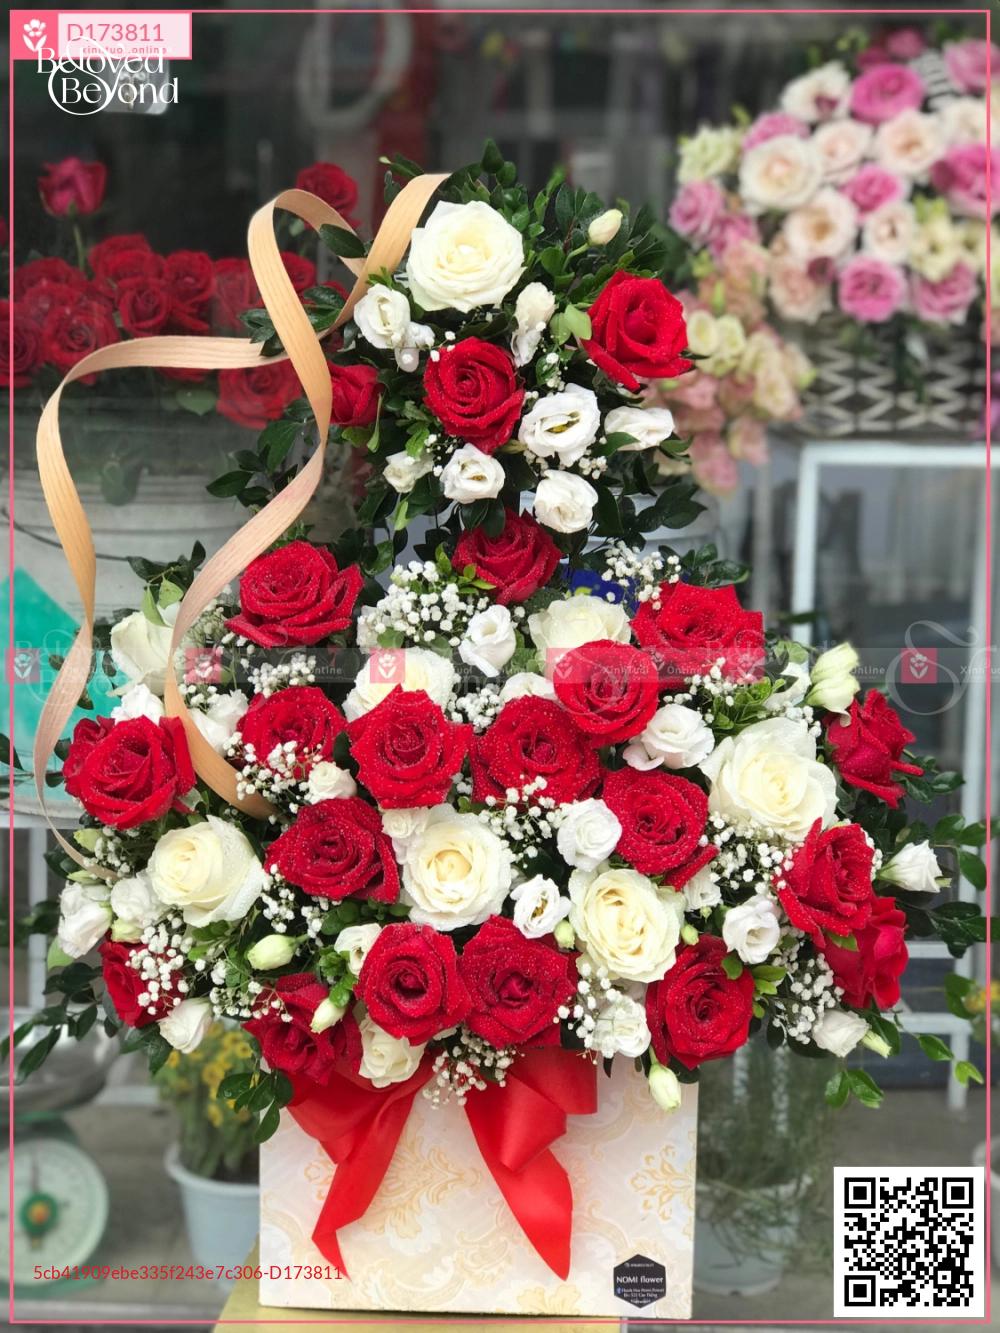 Mùa yêu - D173811 - xinhtuoi.online